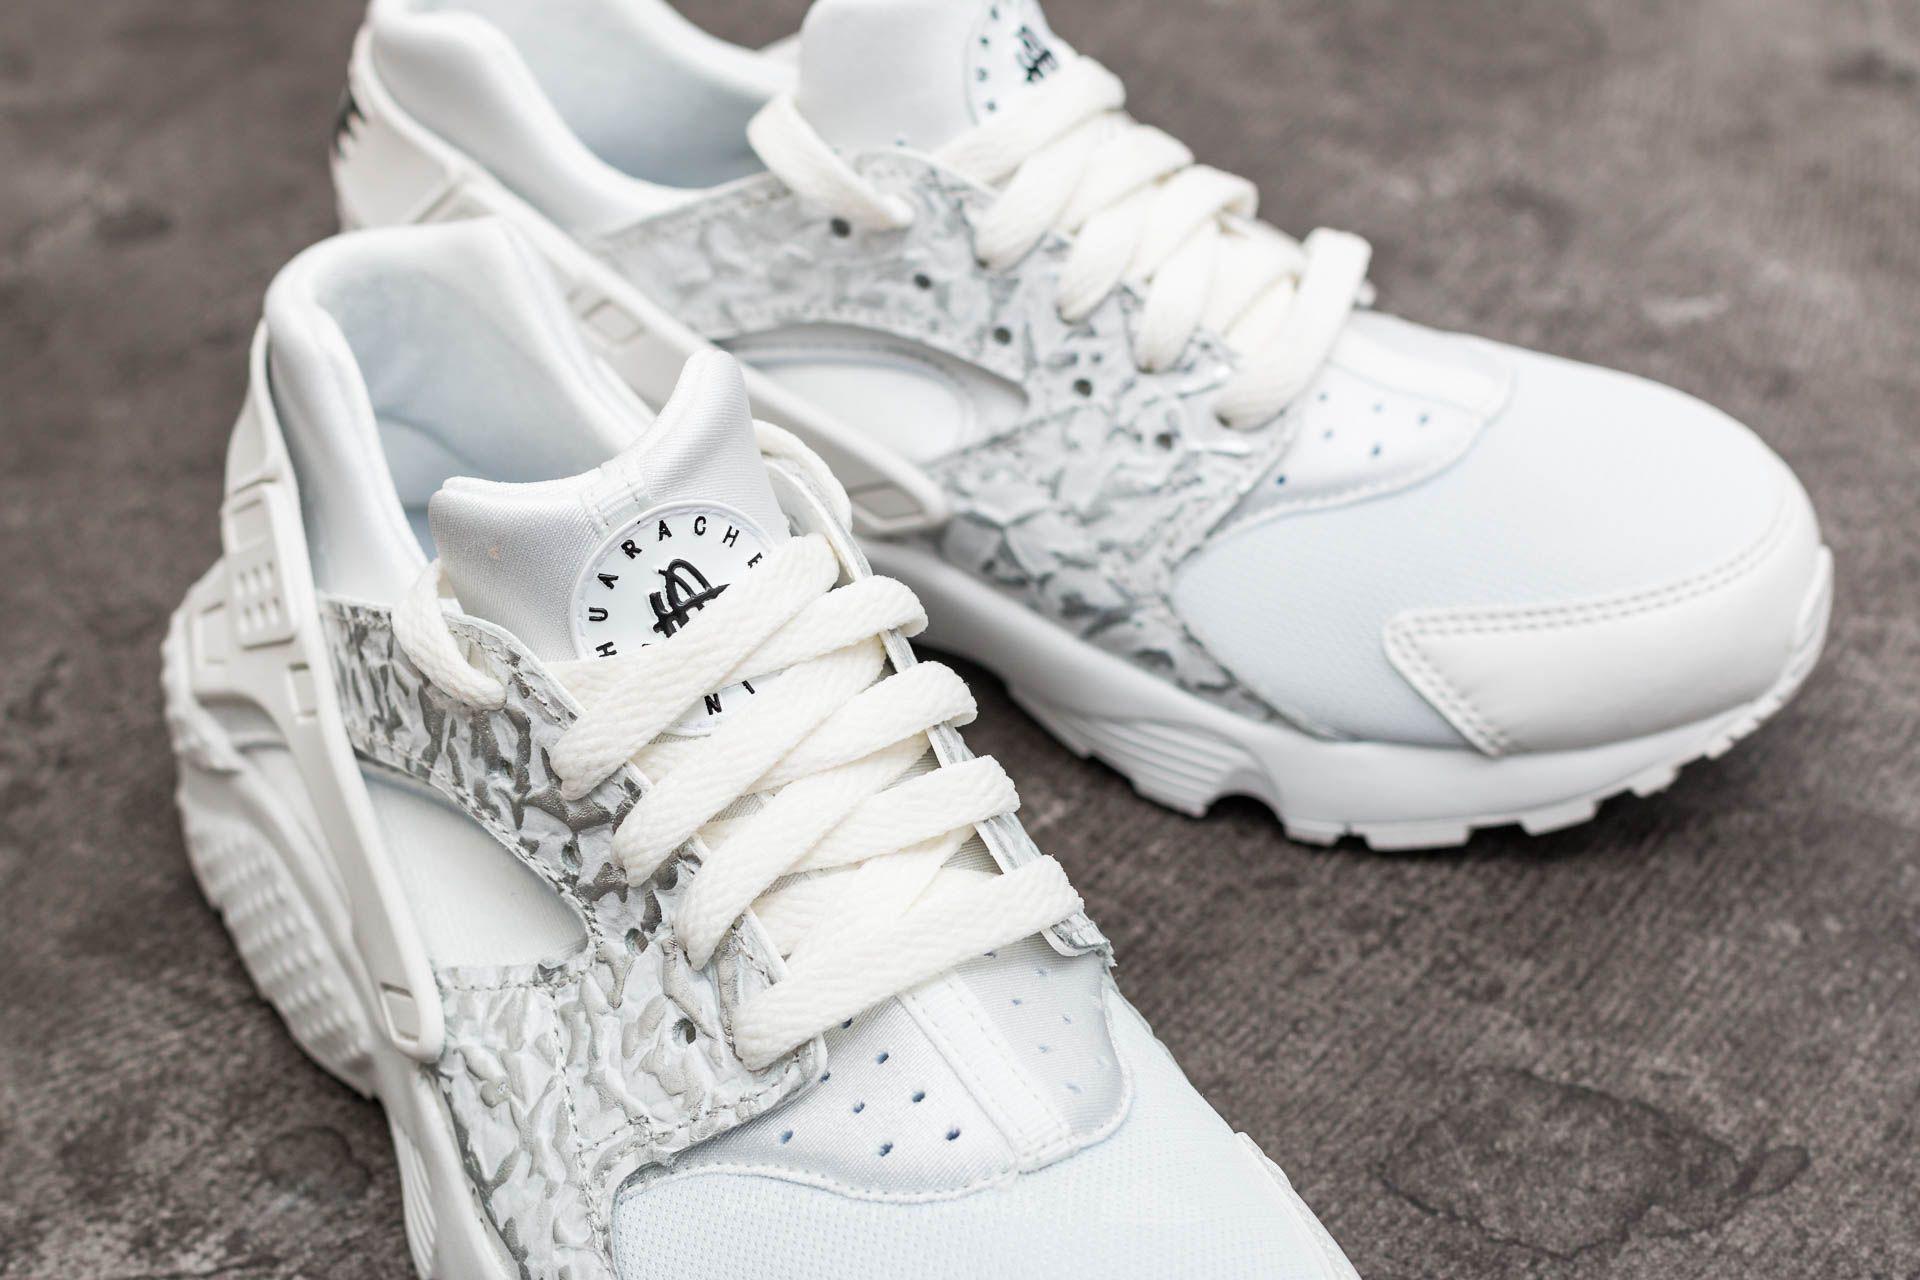 898c974bf4b3 Lyst - Nike Huarache Run Se (gs) Summit White  Metallic Silver in ...